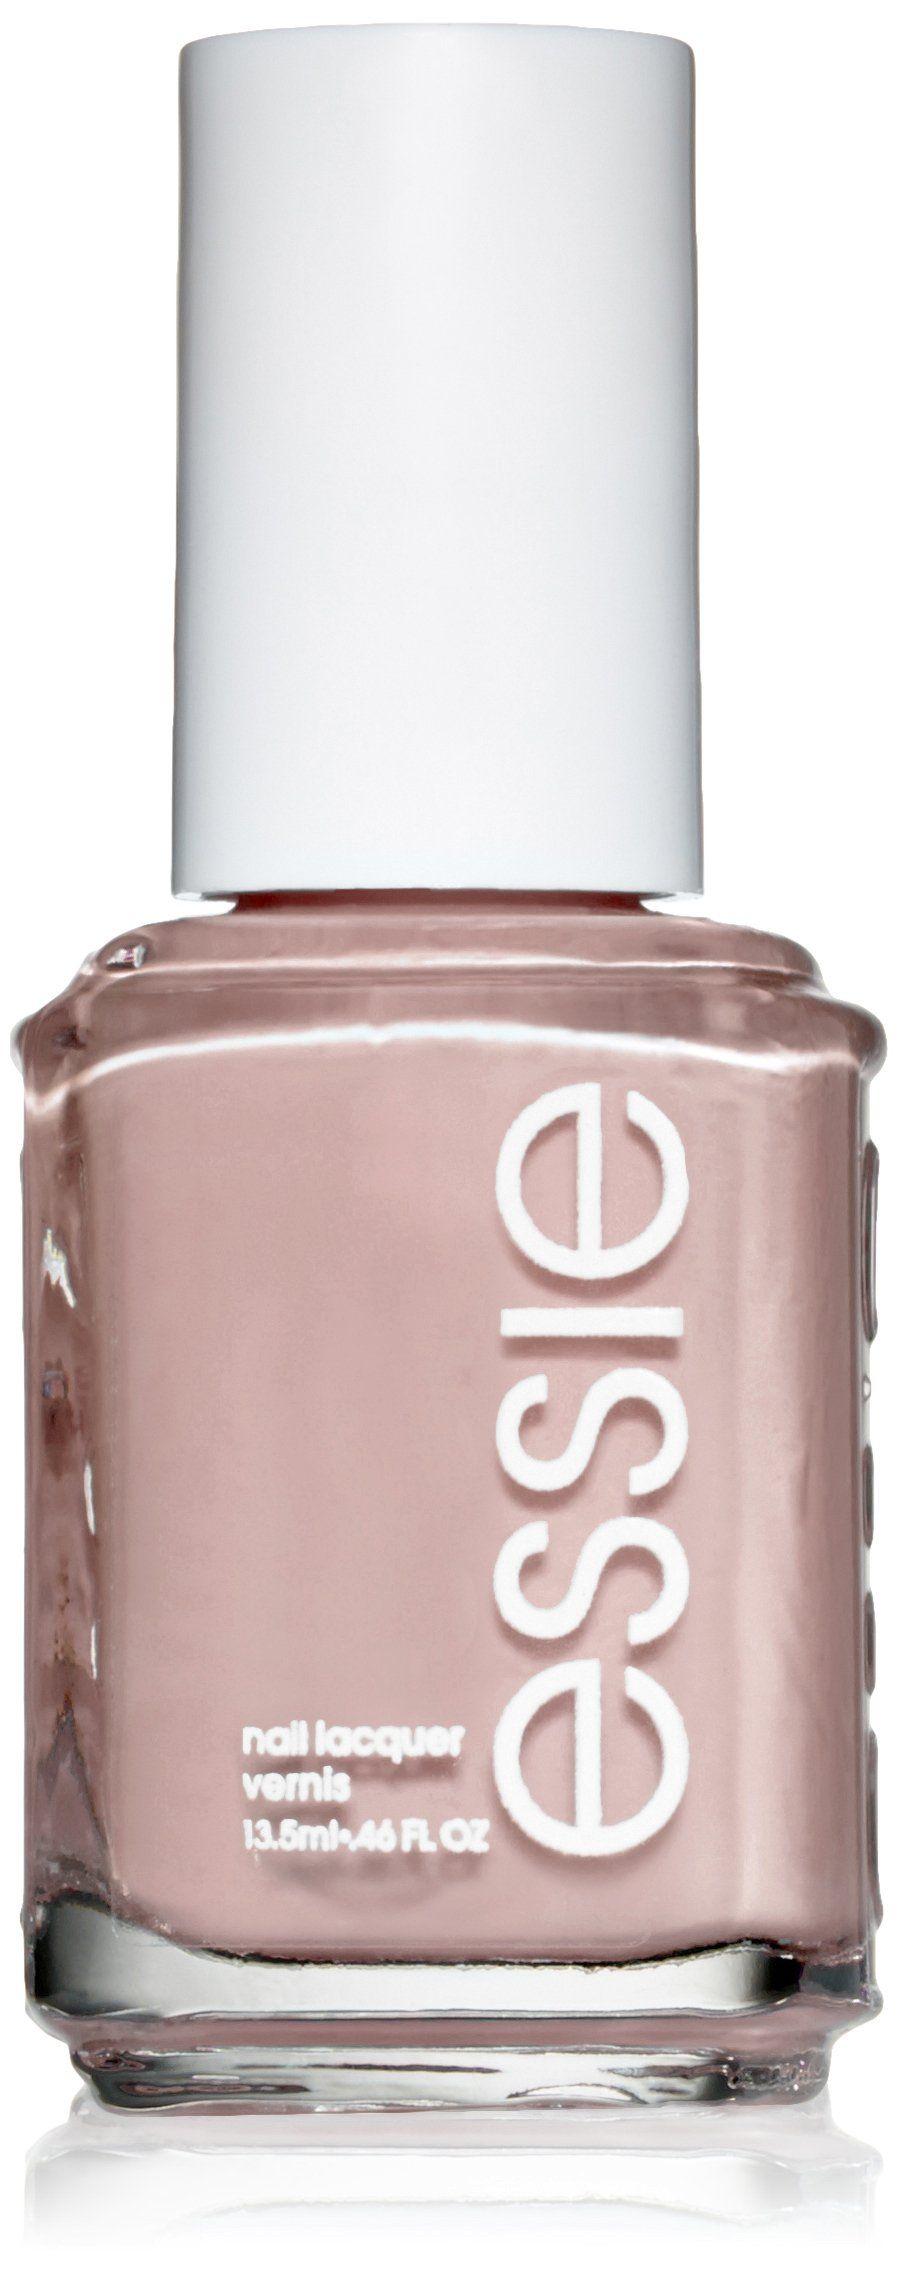 essie nail polish, lady like, 0.46 fl. oz. DBP, Toluene, and ...